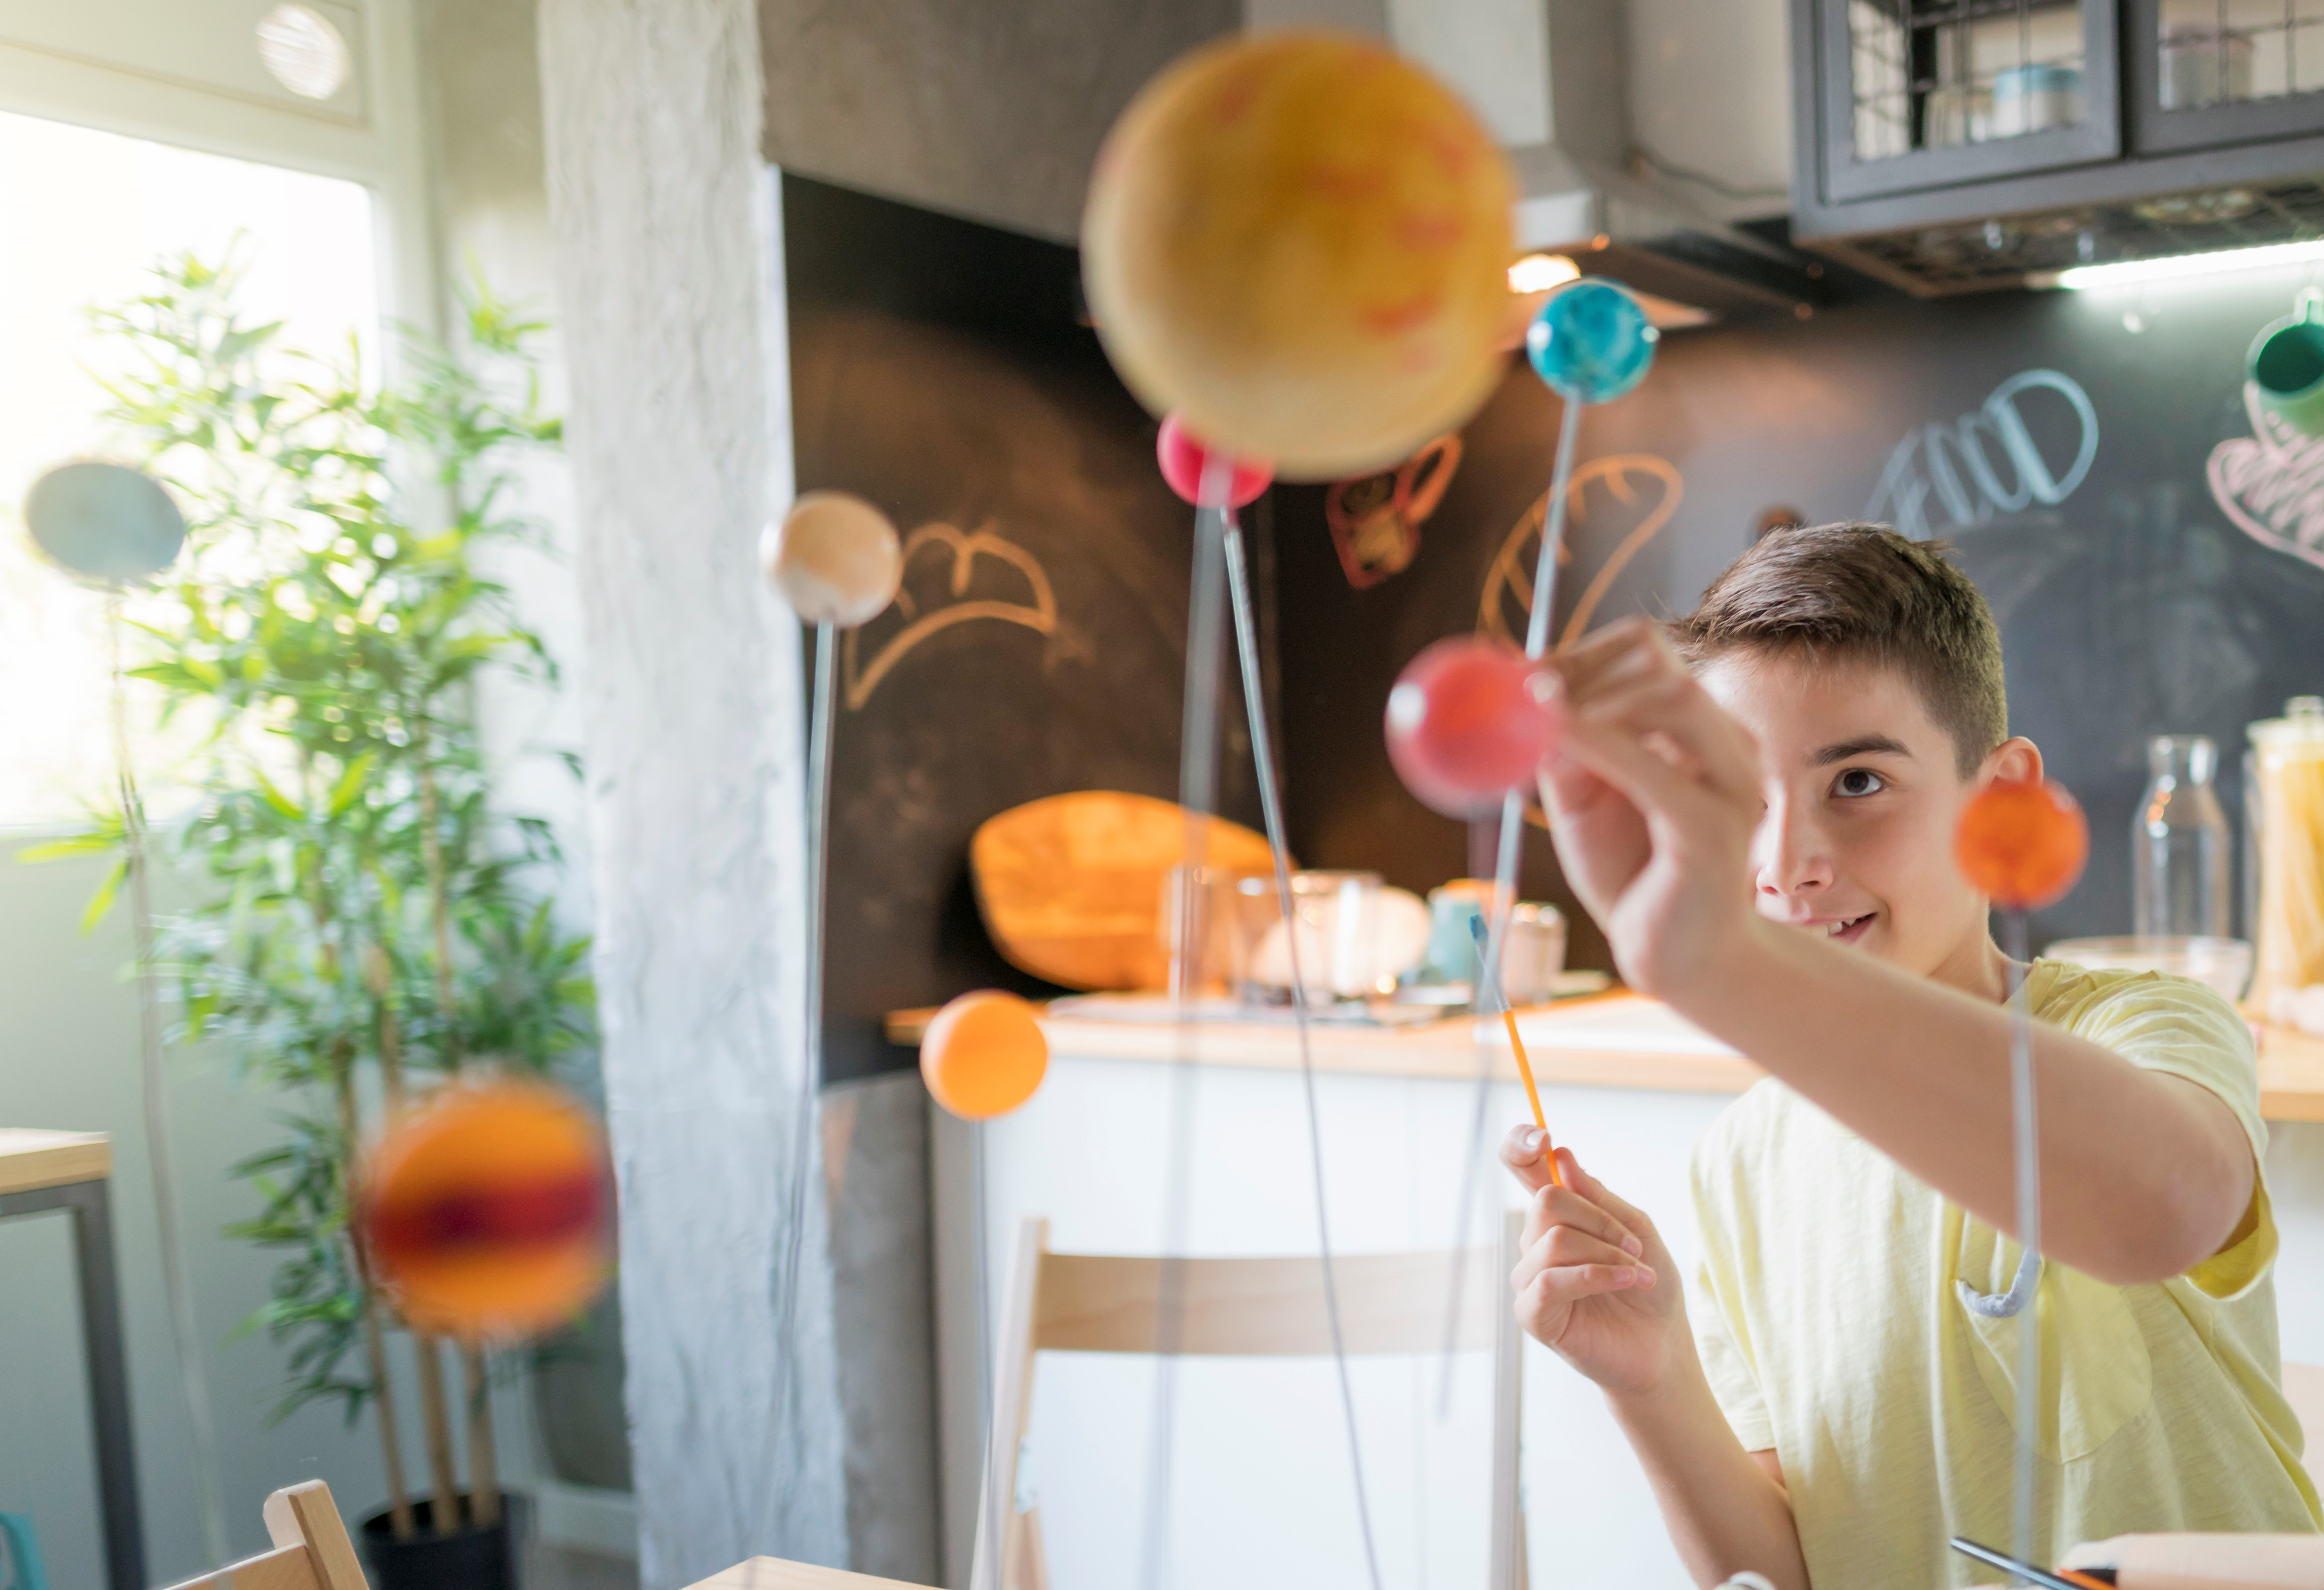 A student examines a solar system model